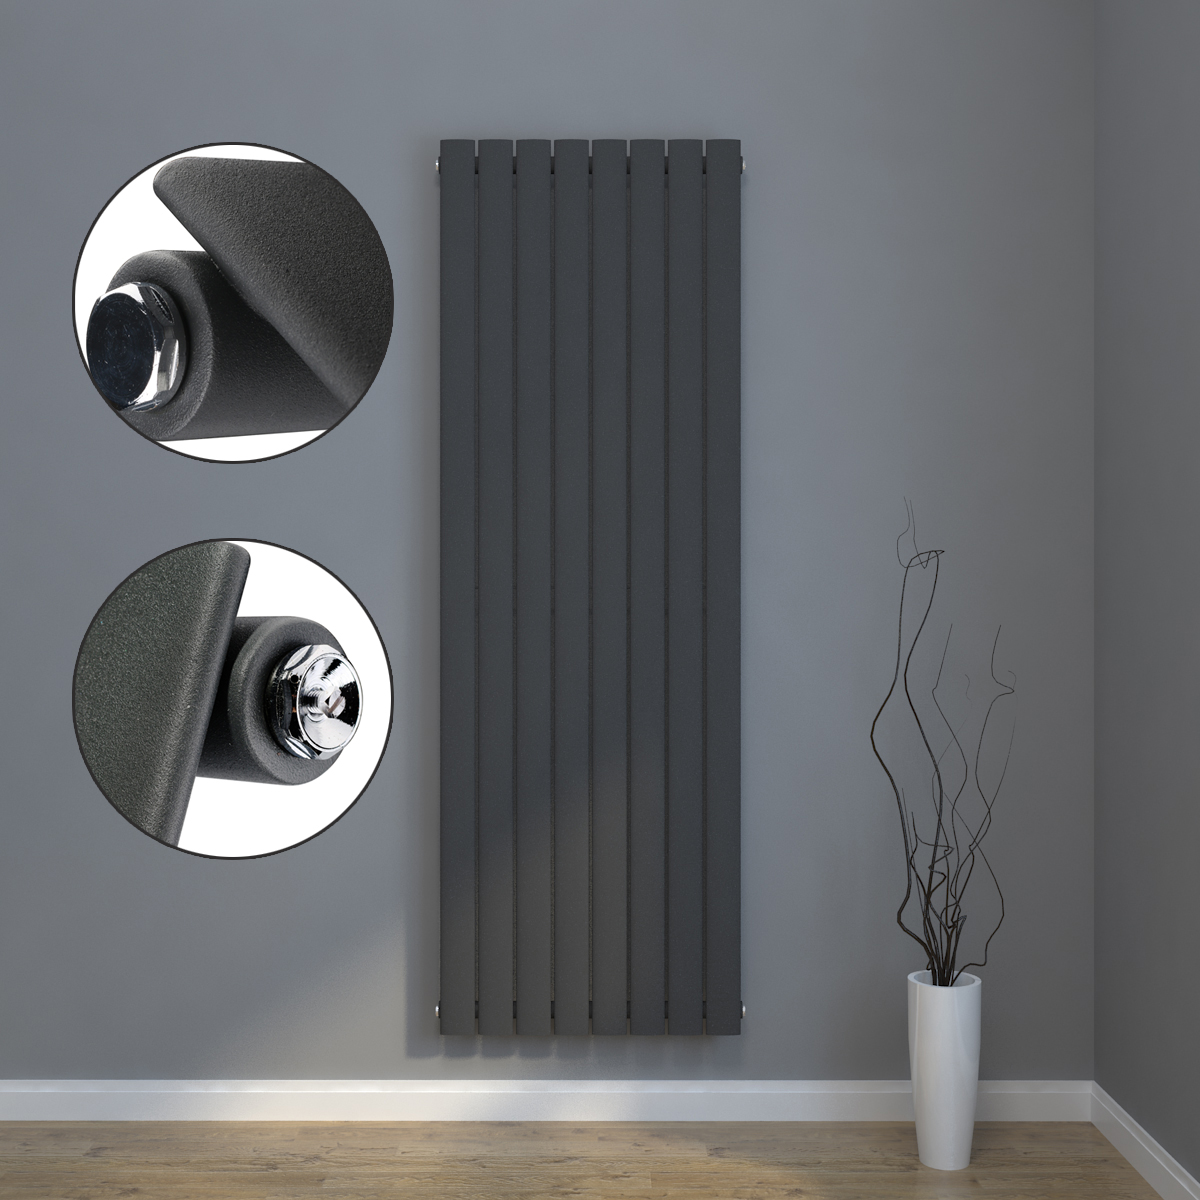 design flach heizk rper badheizk rper mittelanschluss heizk rper wandheizk rper ebay. Black Bedroom Furniture Sets. Home Design Ideas